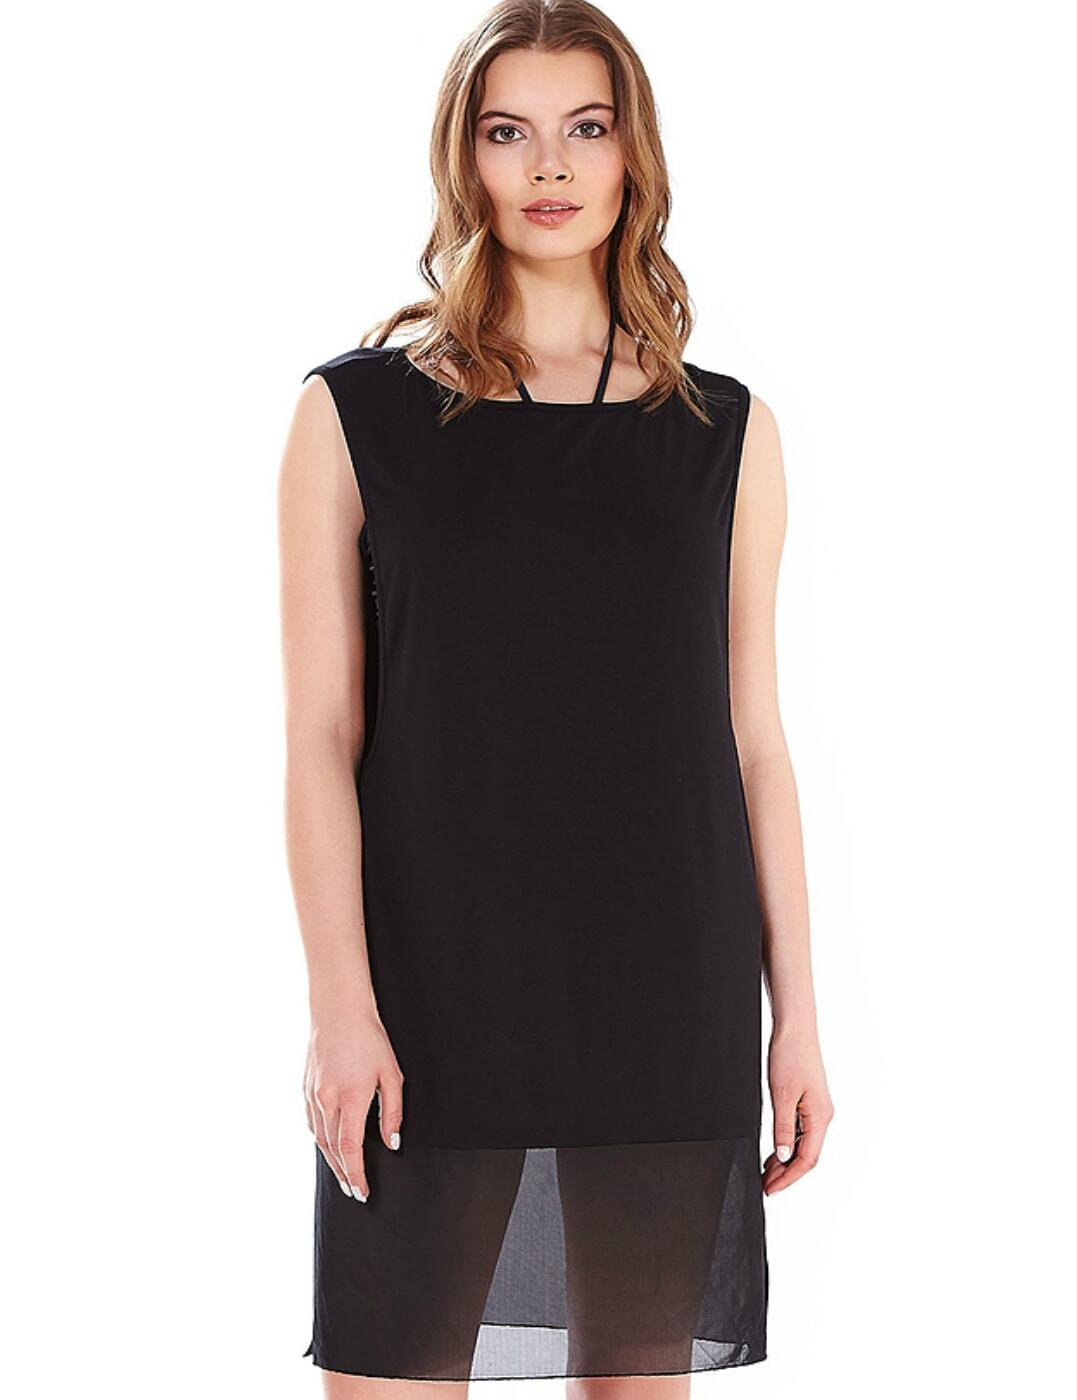 3480 Freya Firestar Jersey Beach Dress - 3480 Black